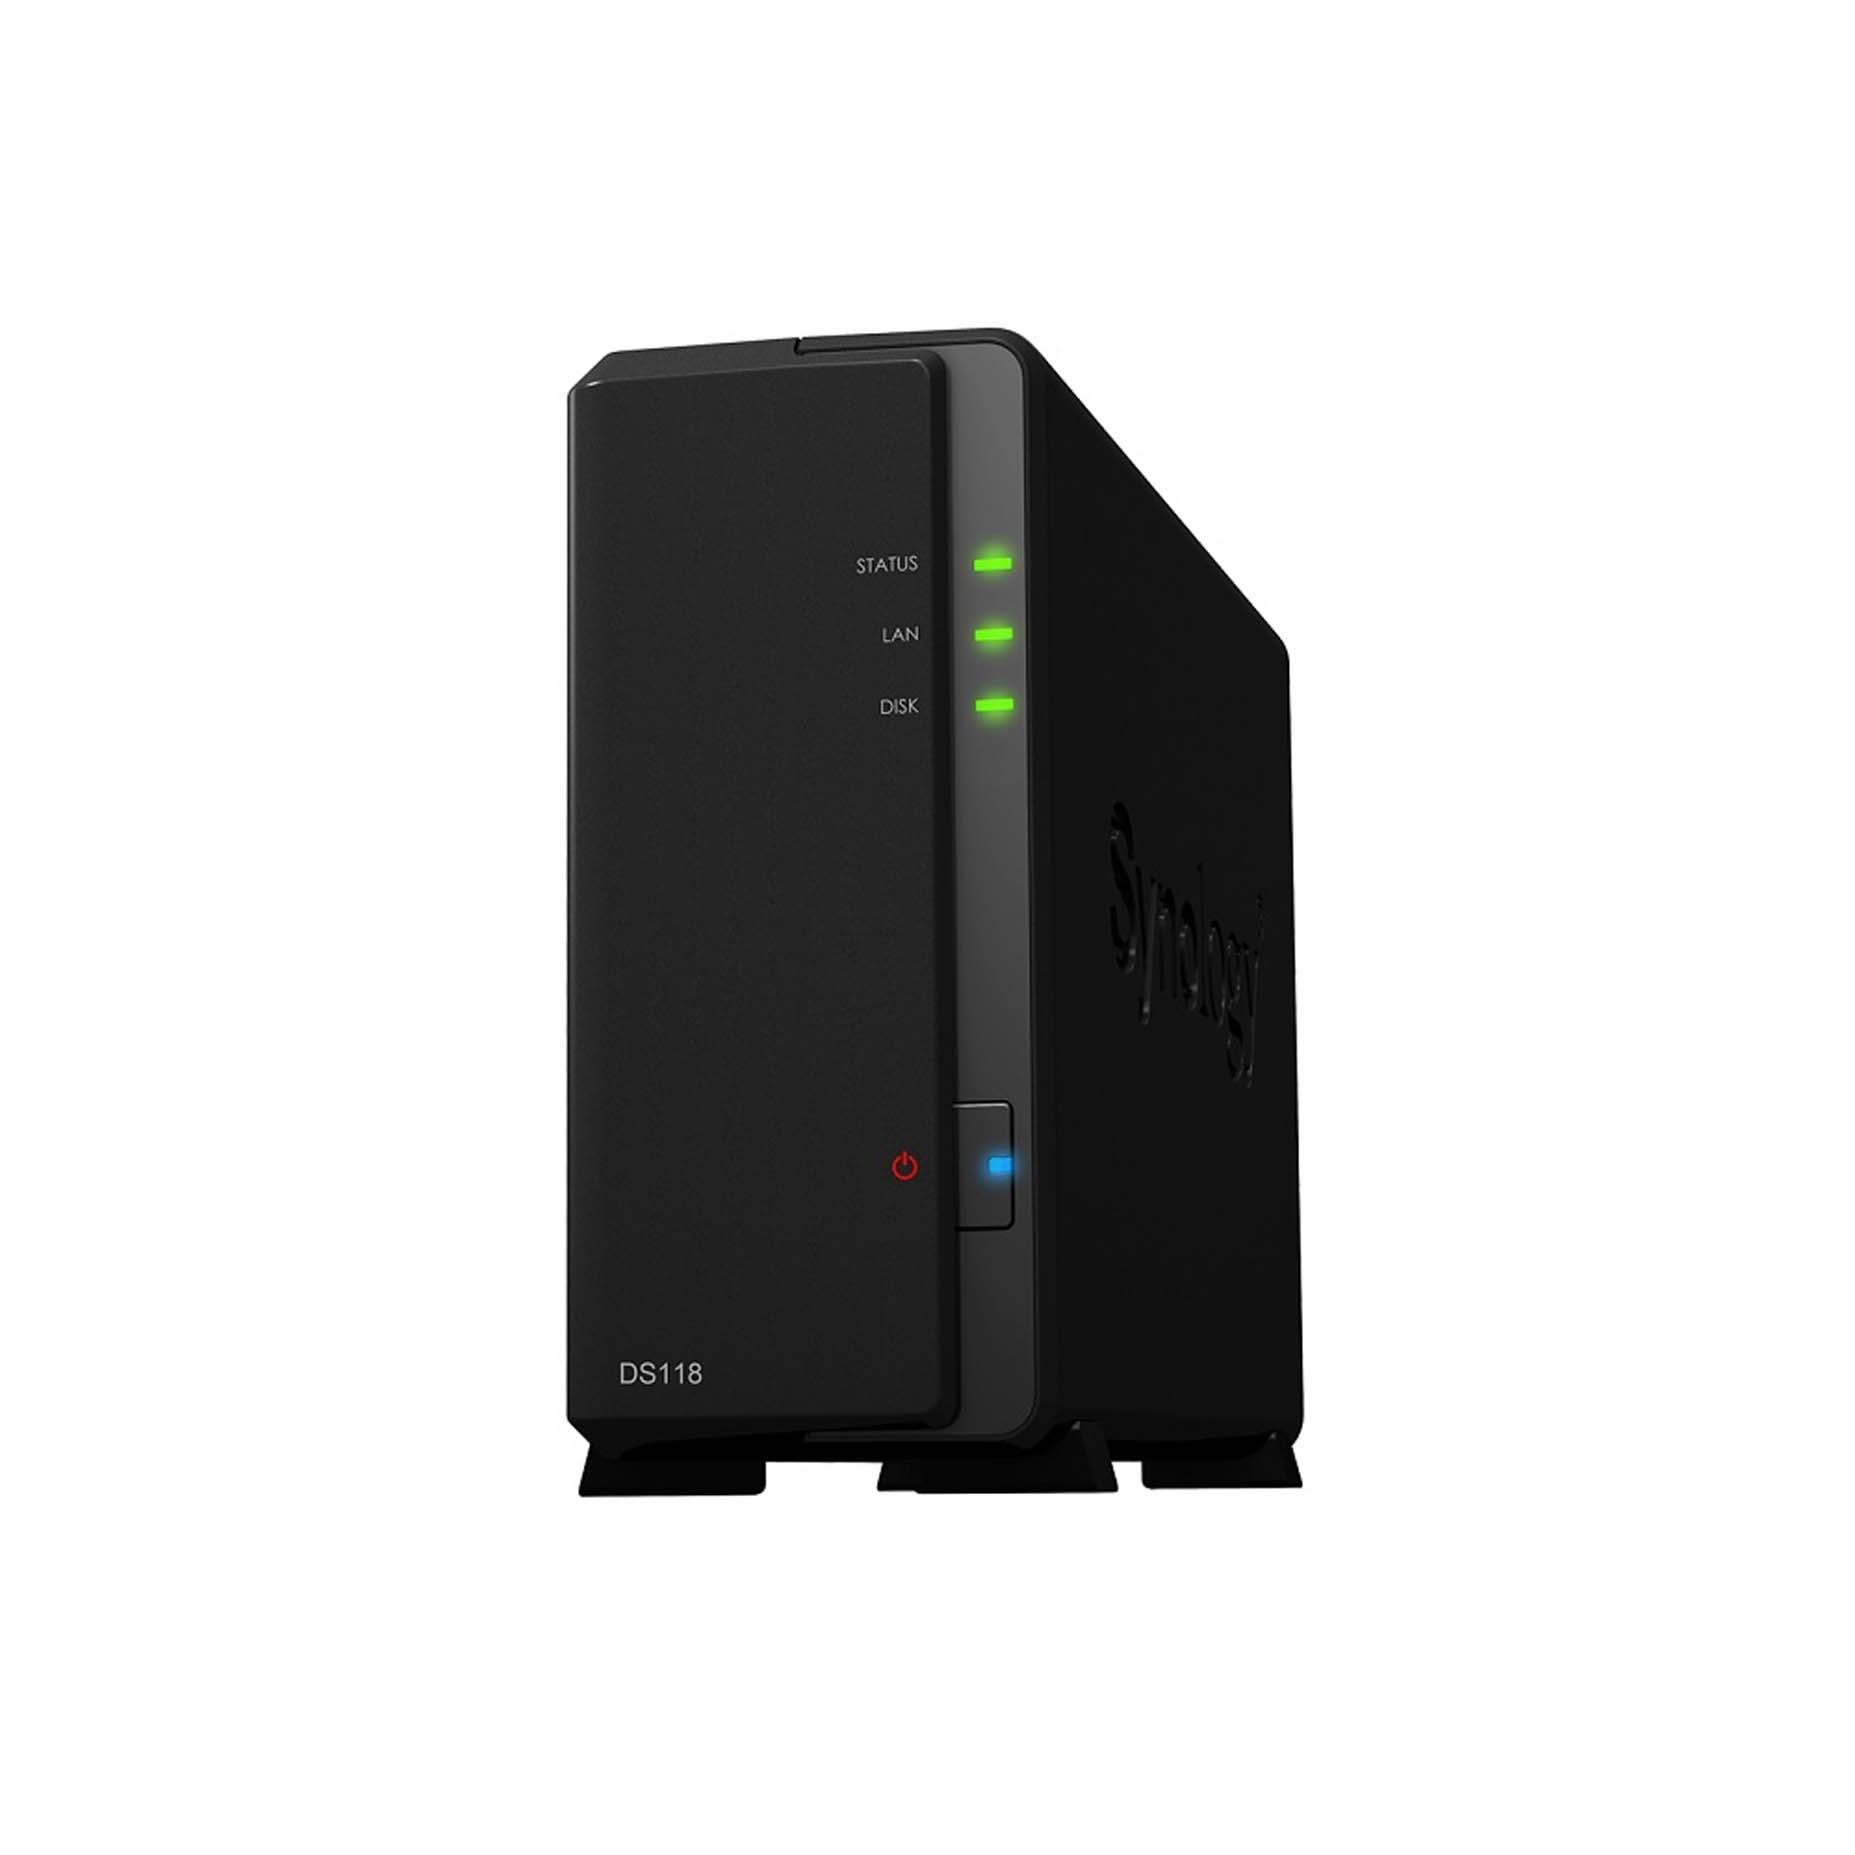 Harga Jual Synology DiskStation DS118 1-bay NAS High-performance